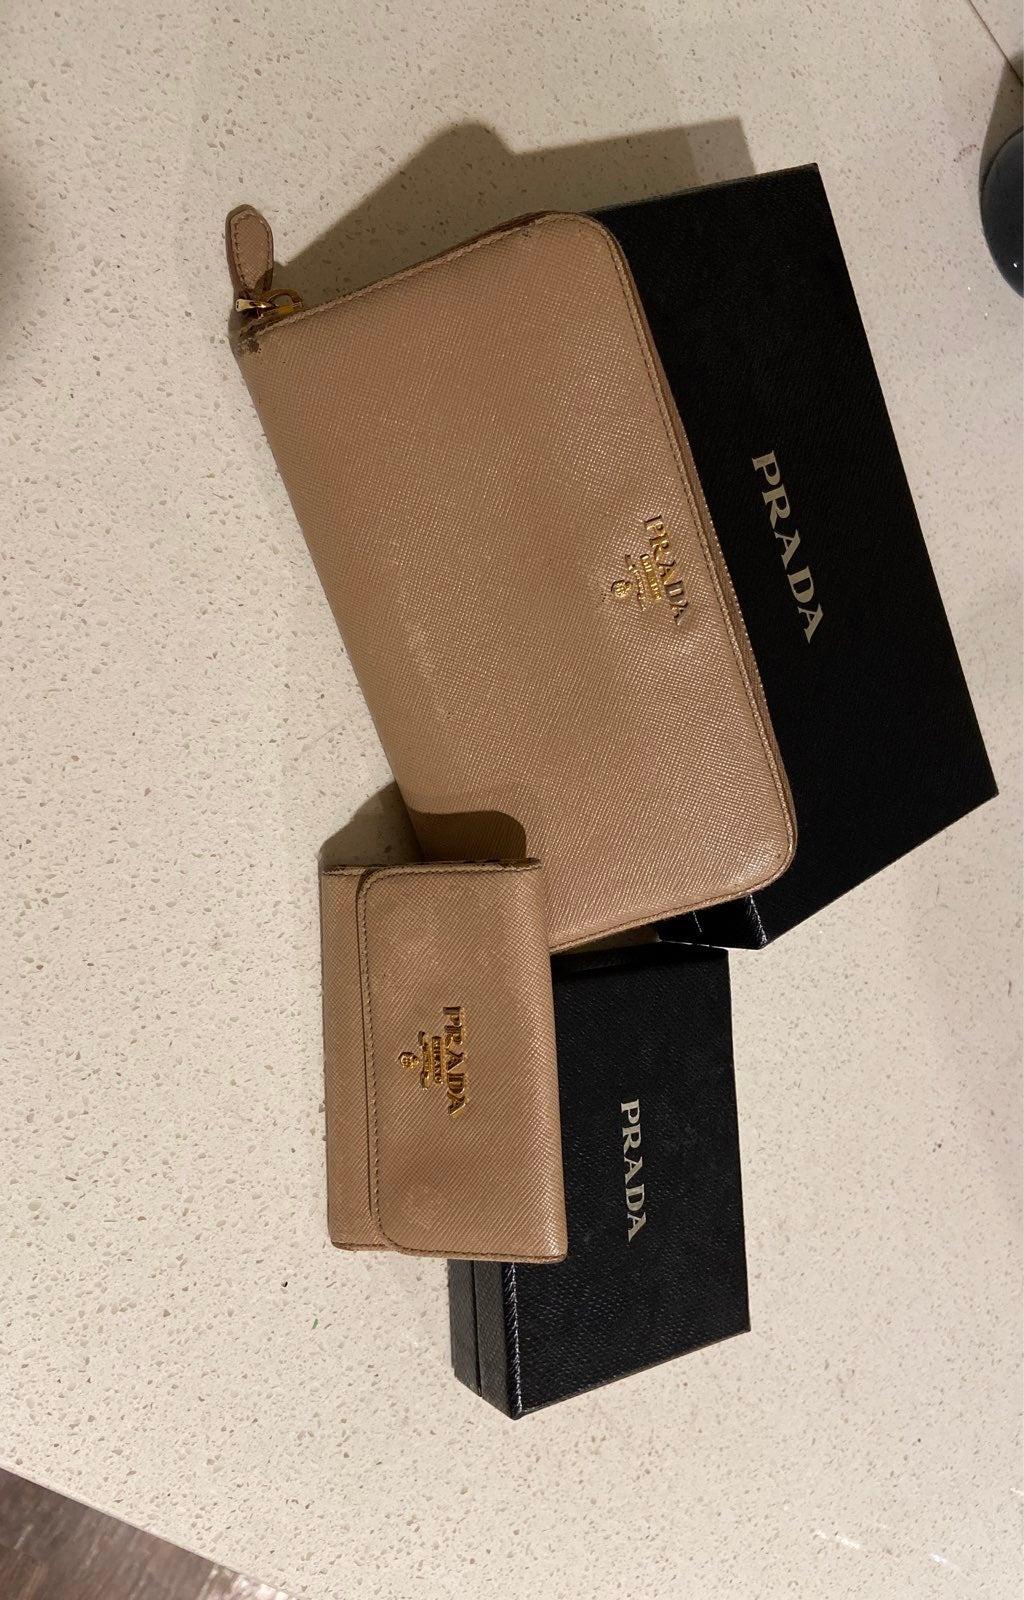 Prada wallet key holder set